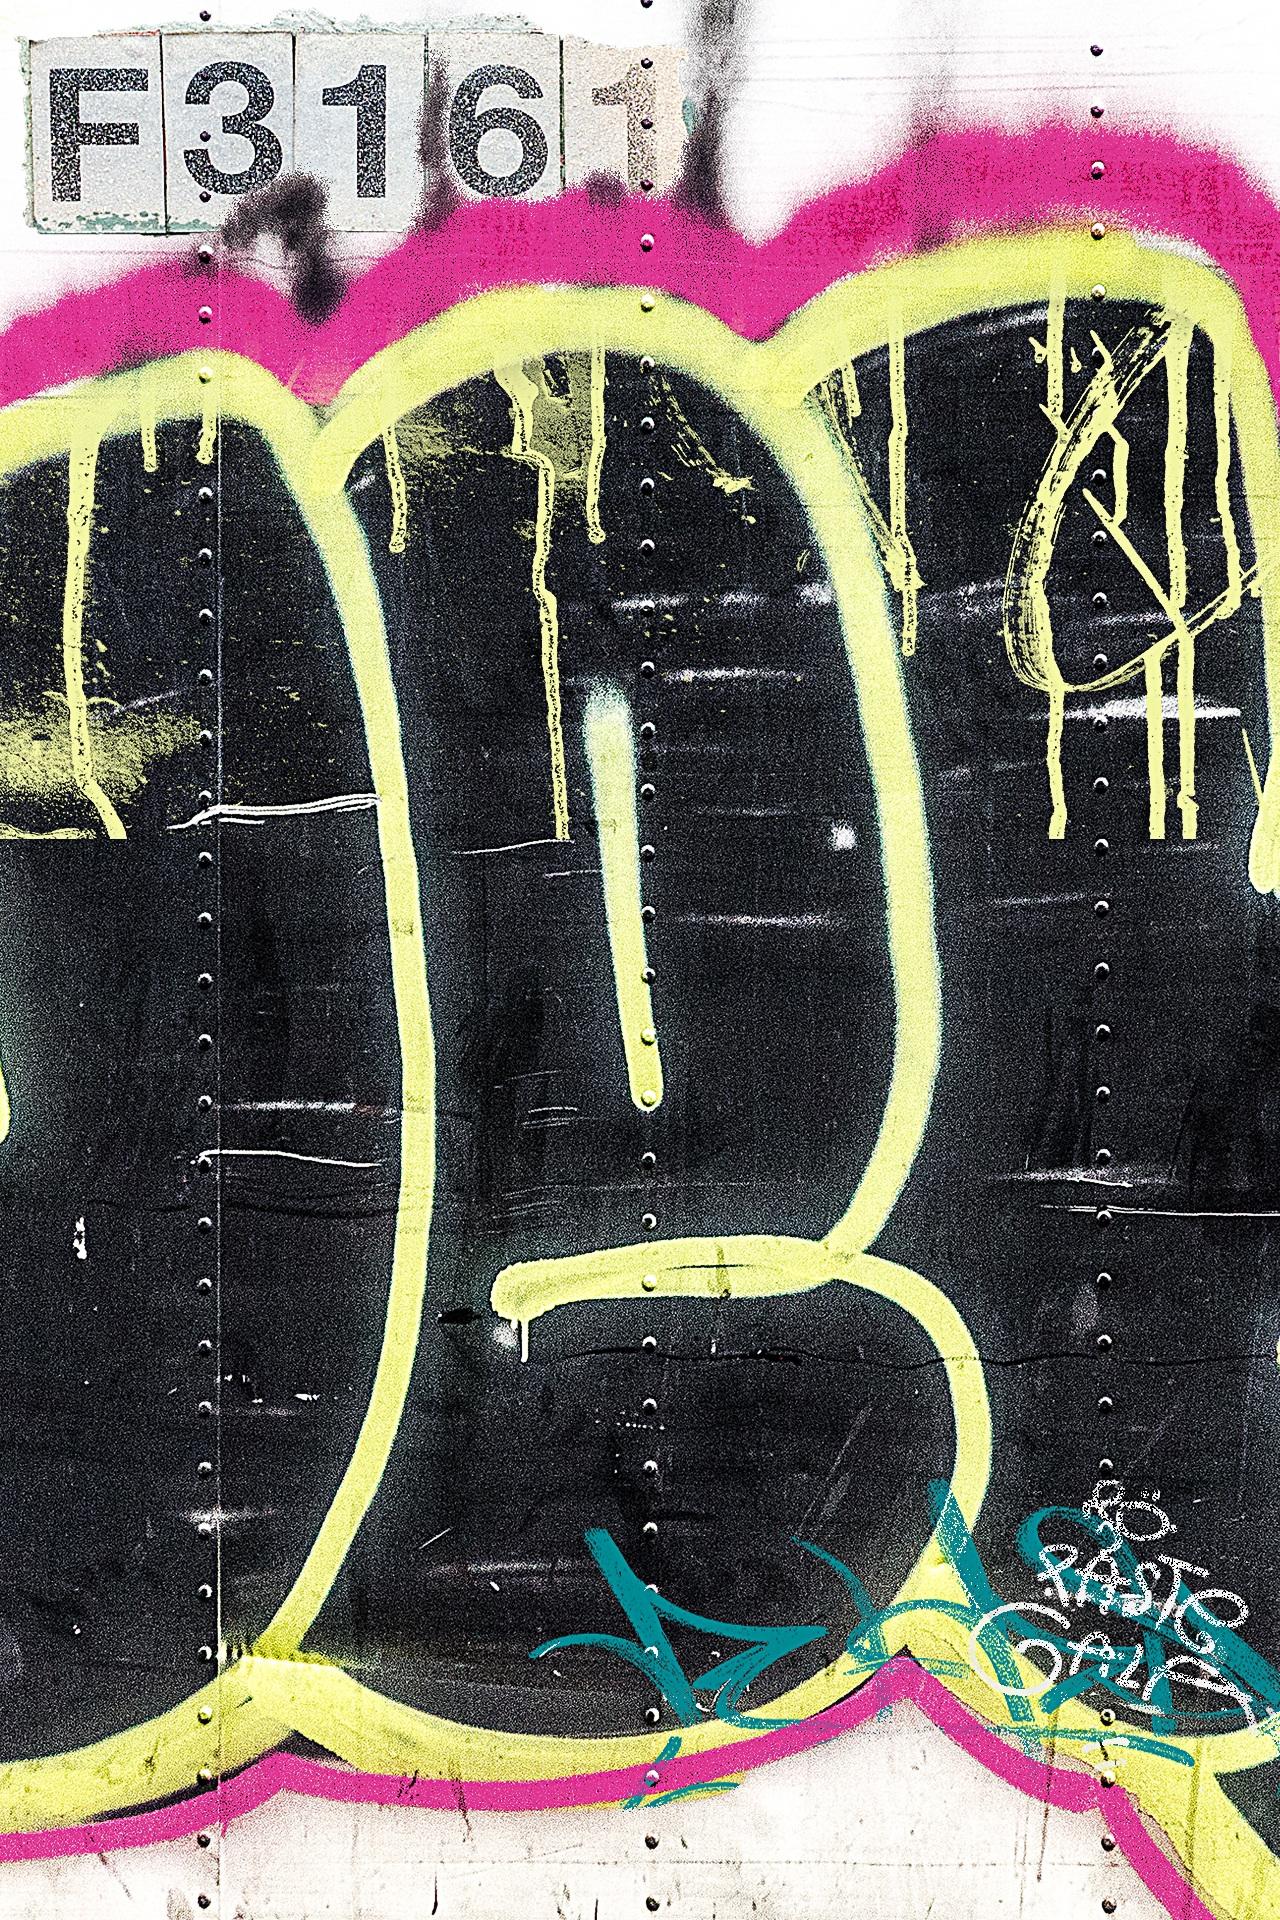 City urban artistic grunge graffiti drip street art font art background drawing illustration mural spray paint